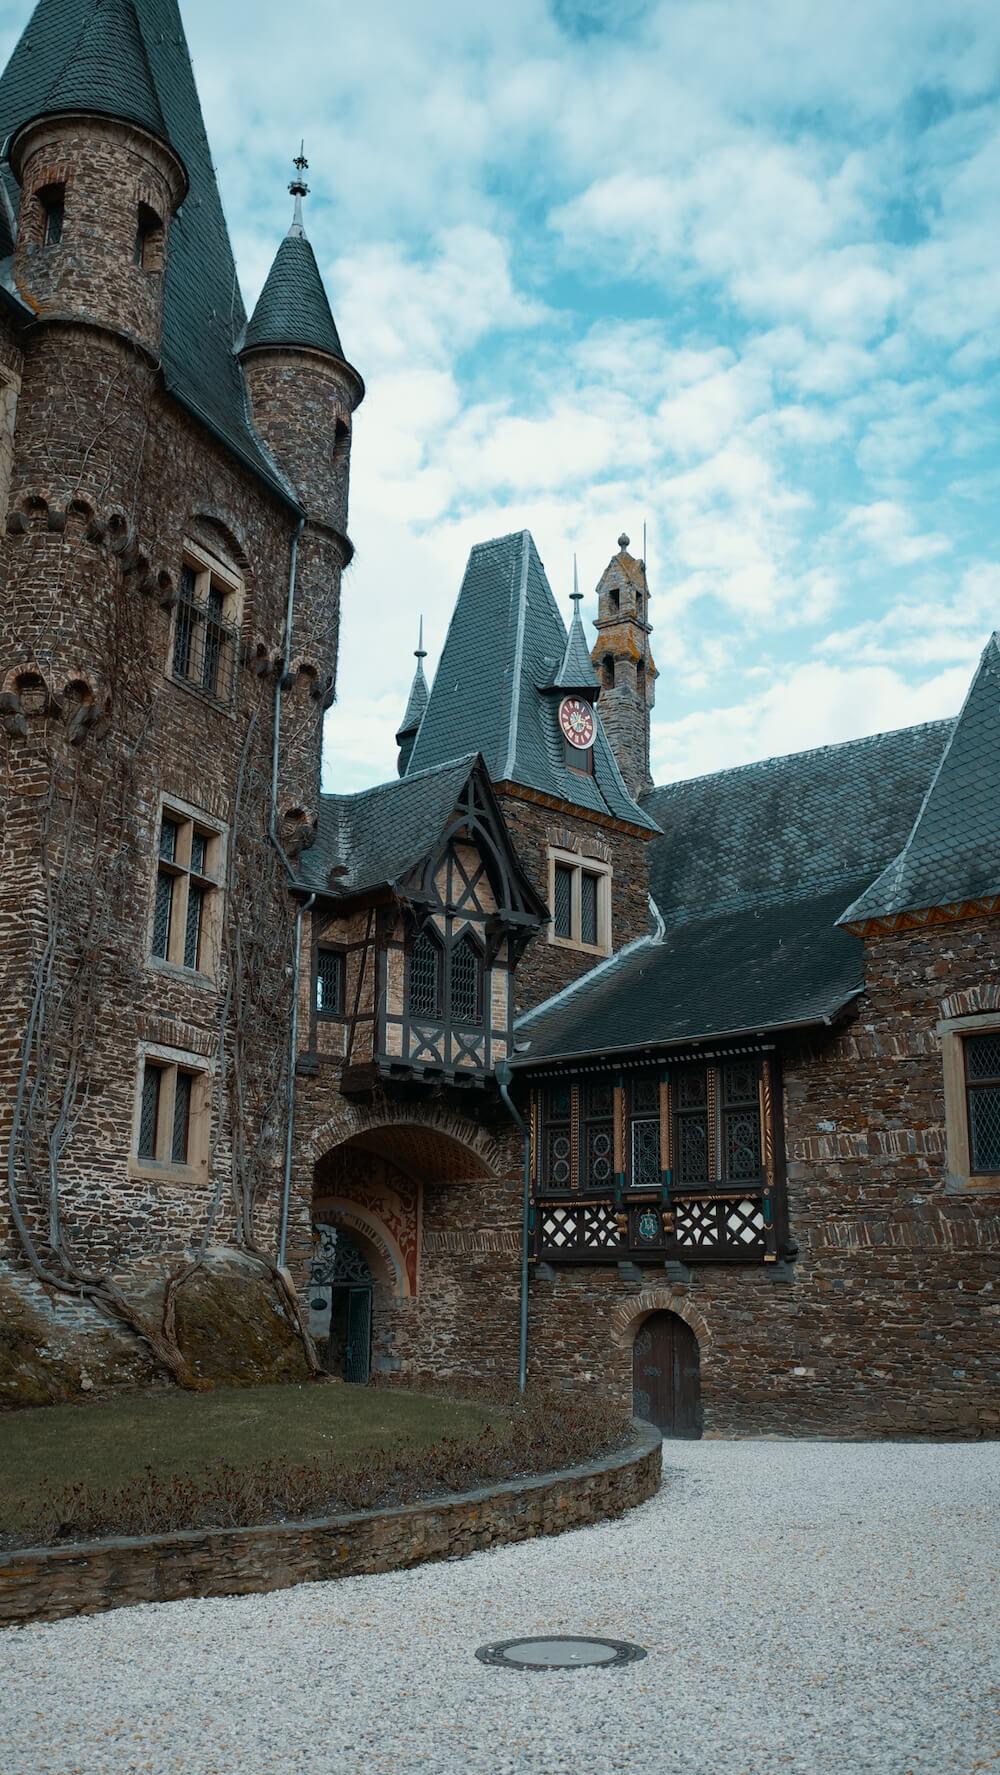 Rijksburch Cochem duitsland tips